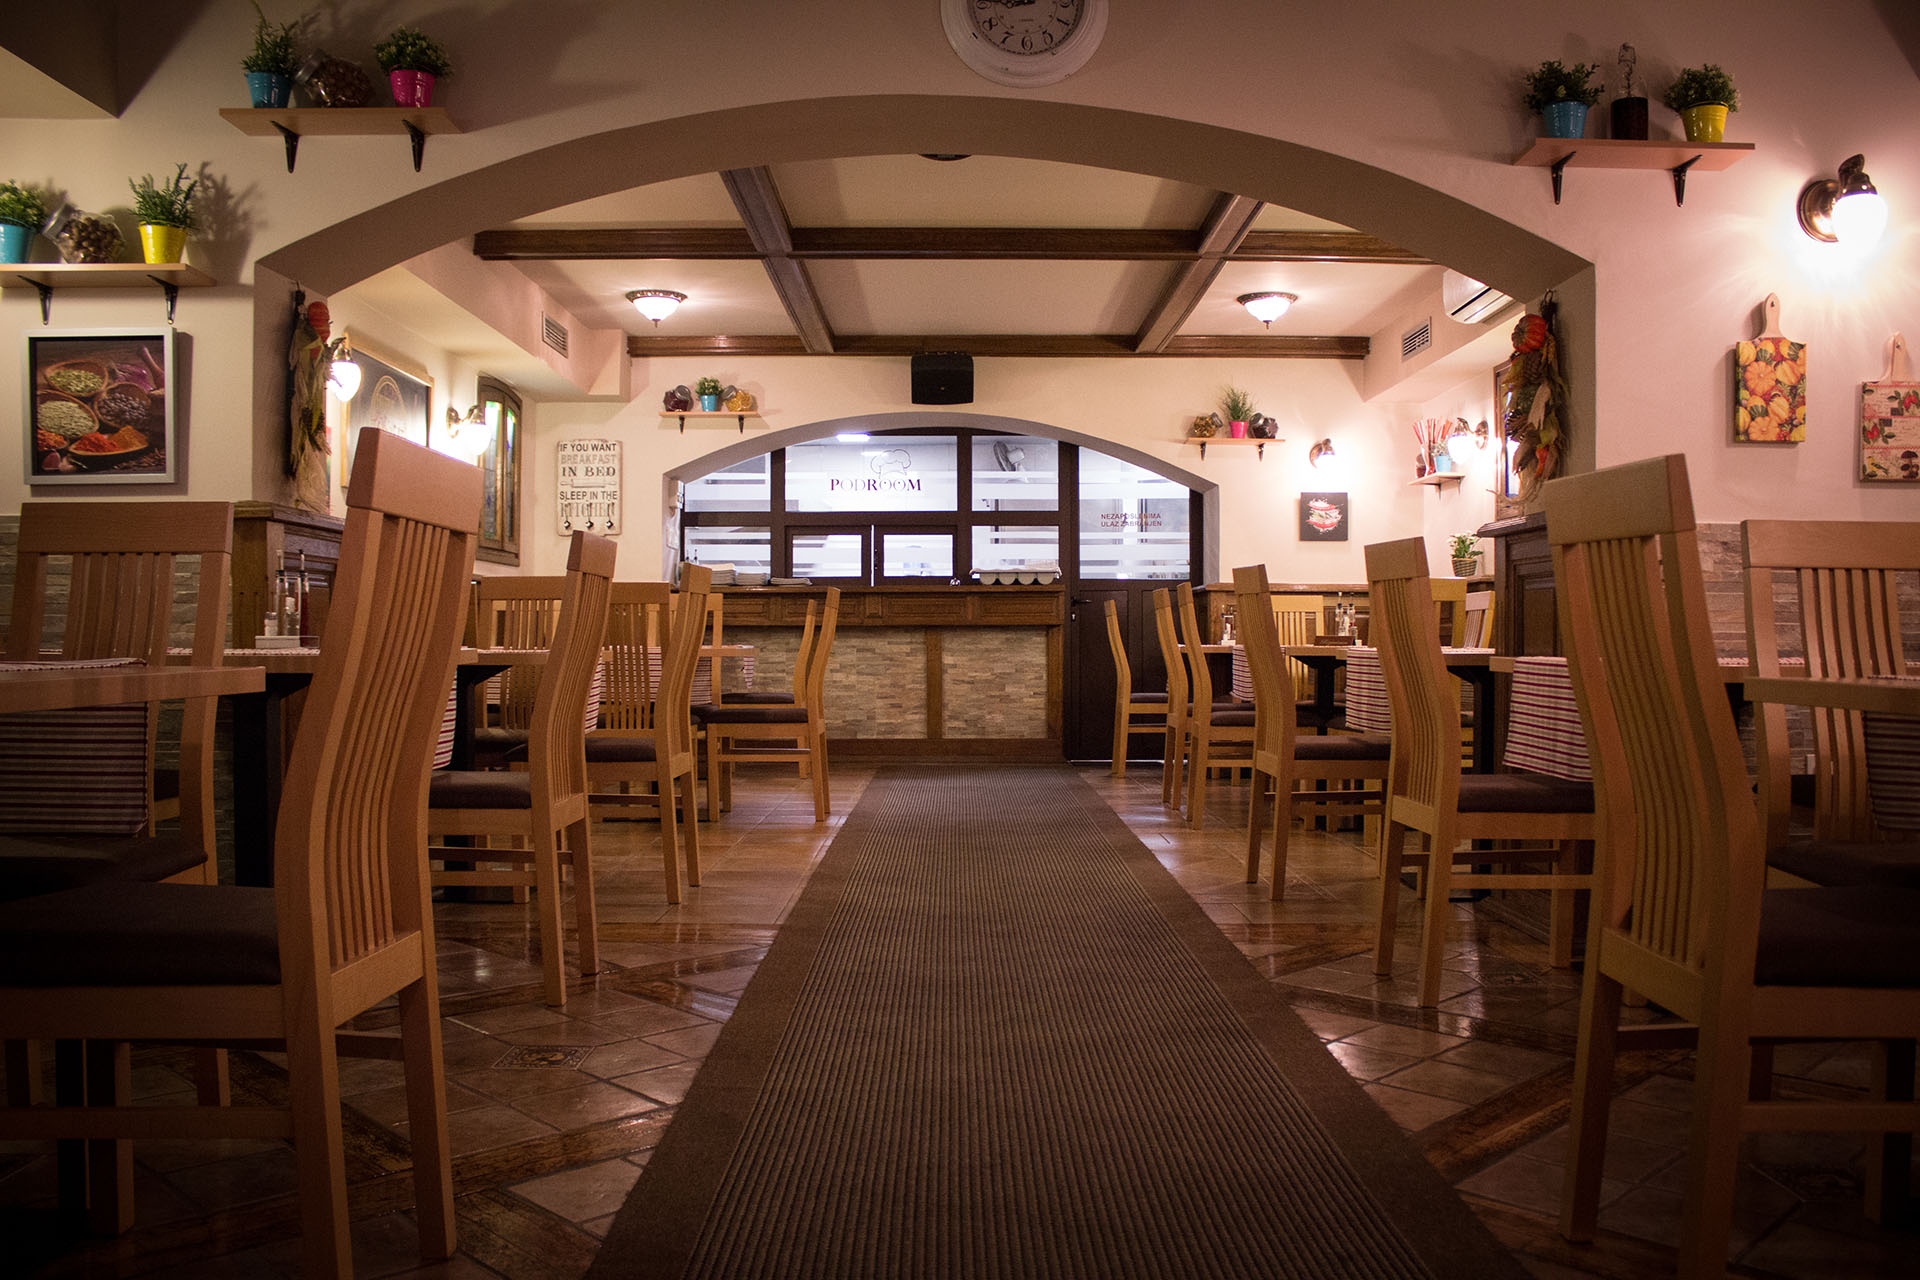 slider_2_podroom_grill_restoran_slavonski_brod